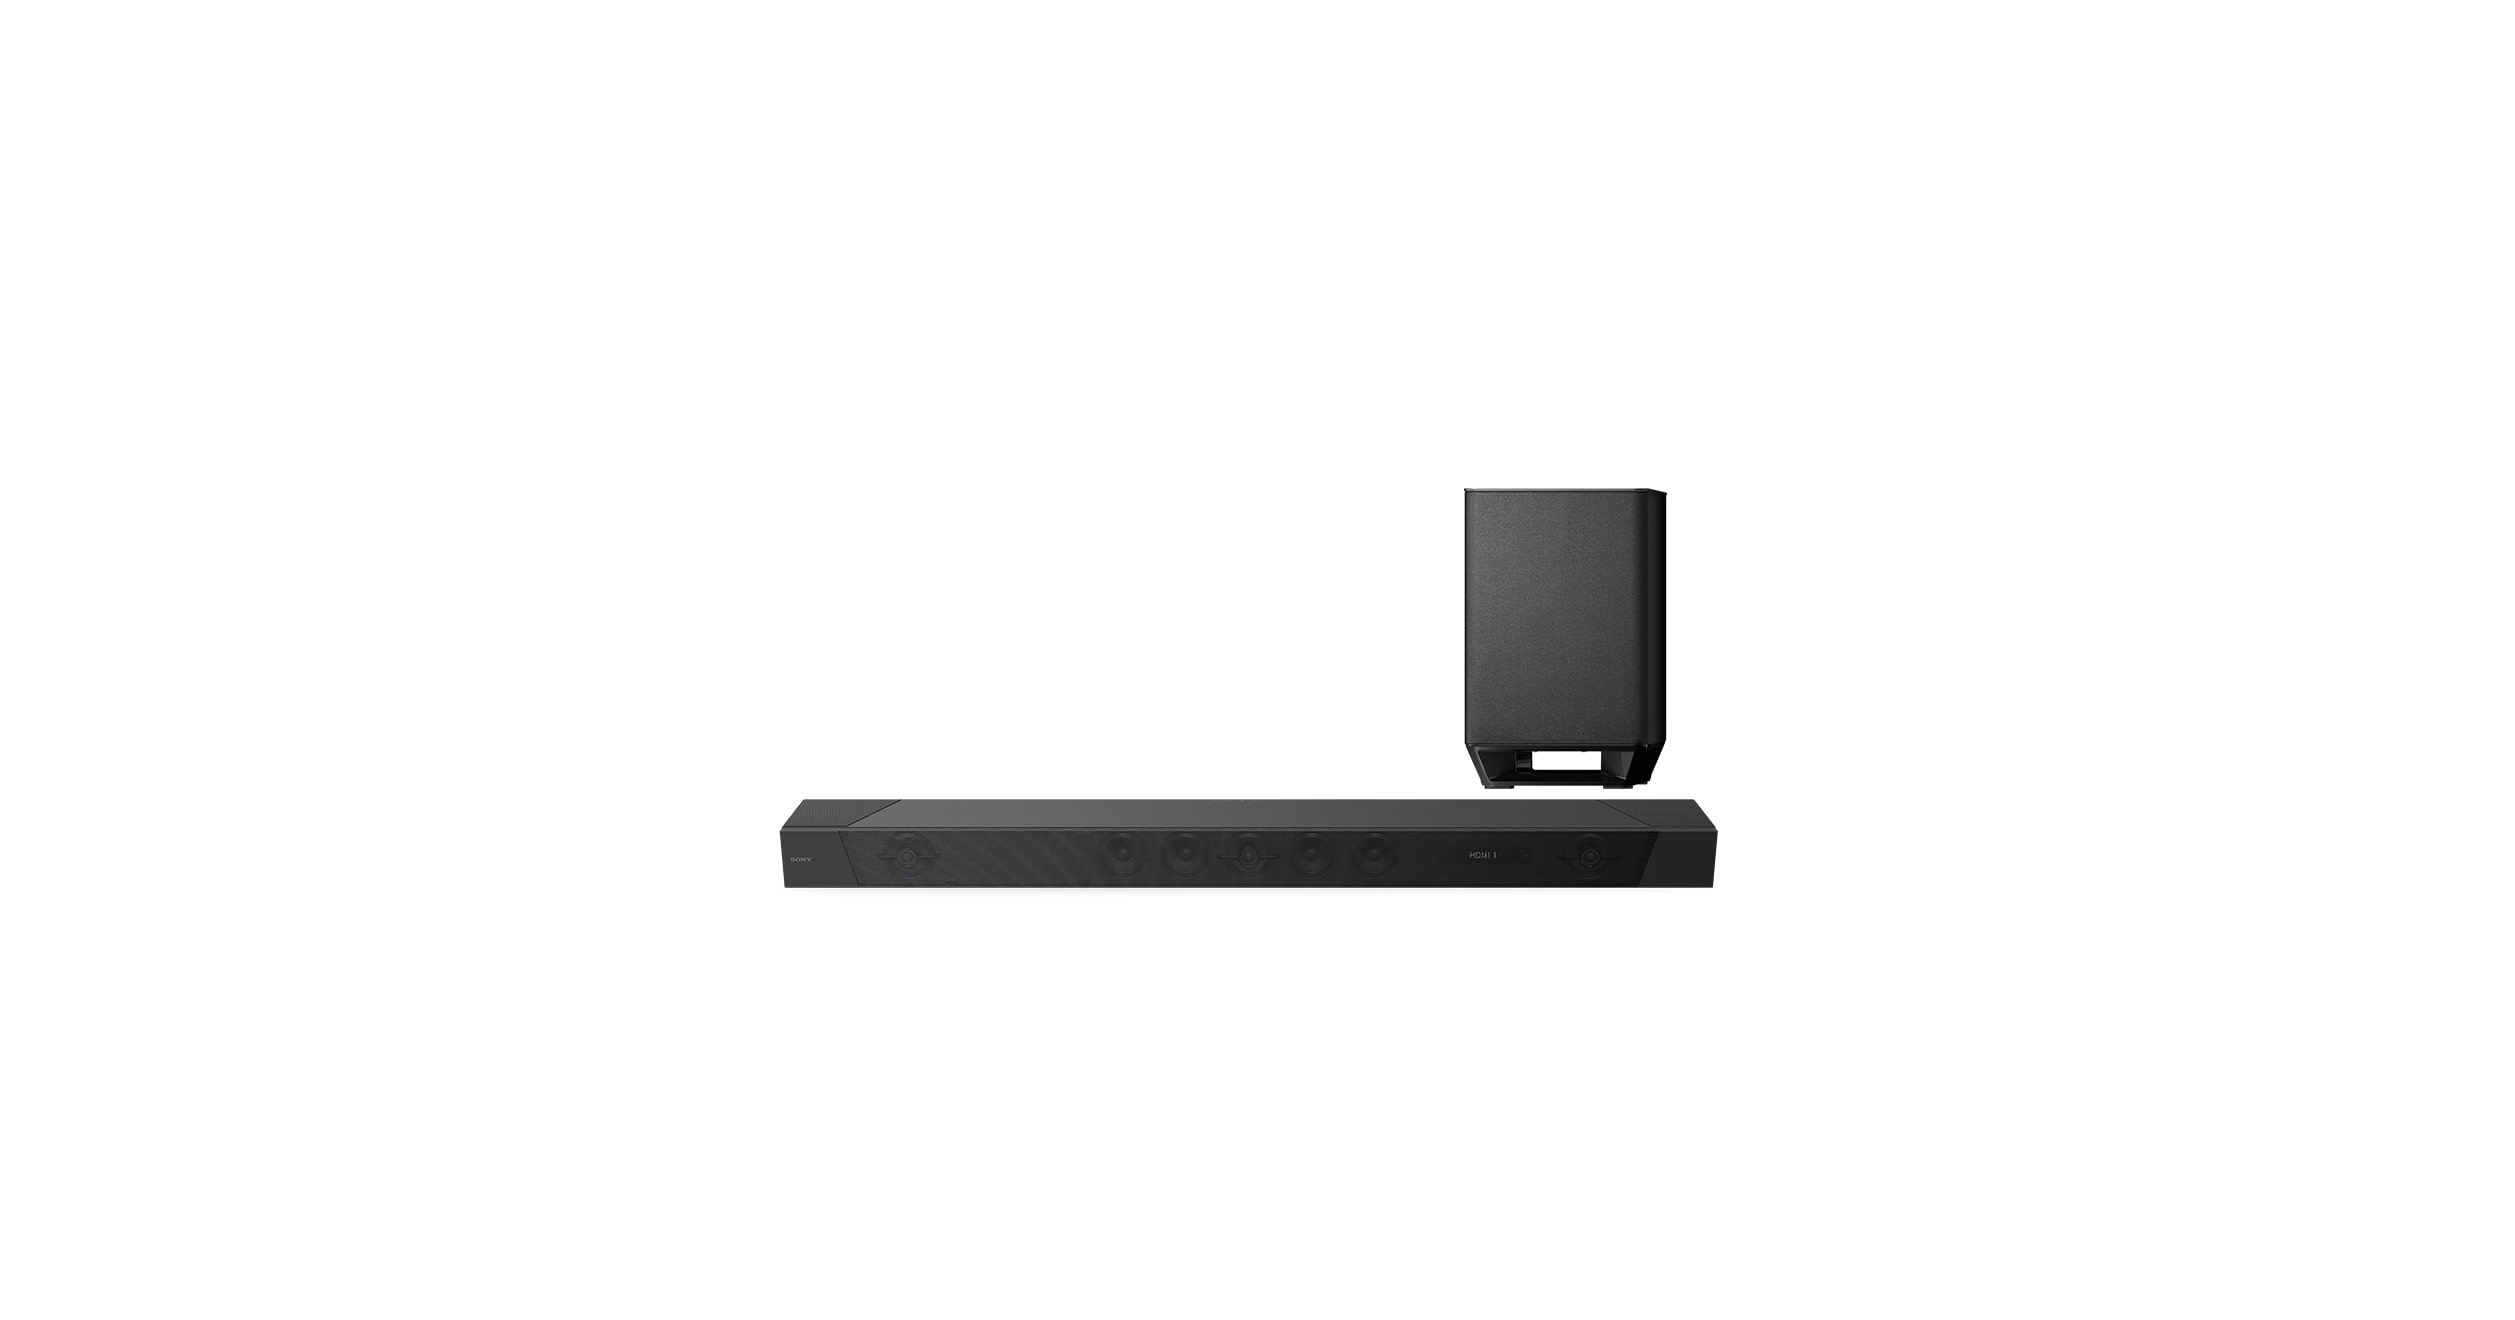 Sony 7 1 2ch Dolby Atmos/DTS:X TM Soundbar with Wi-Fi/Bluetooth technology  |HT-ST5000